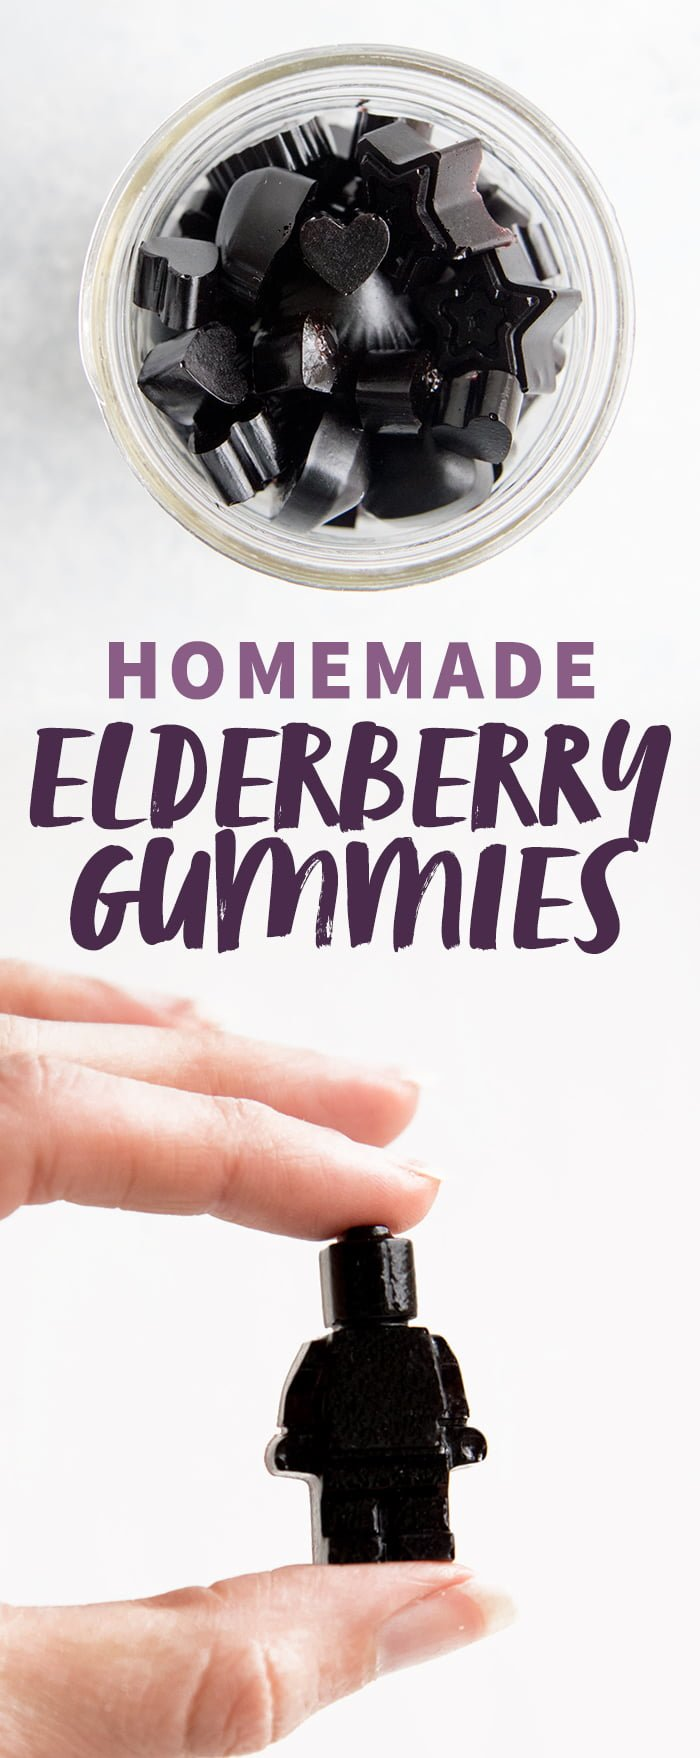 Homemade Elderberry Gummies